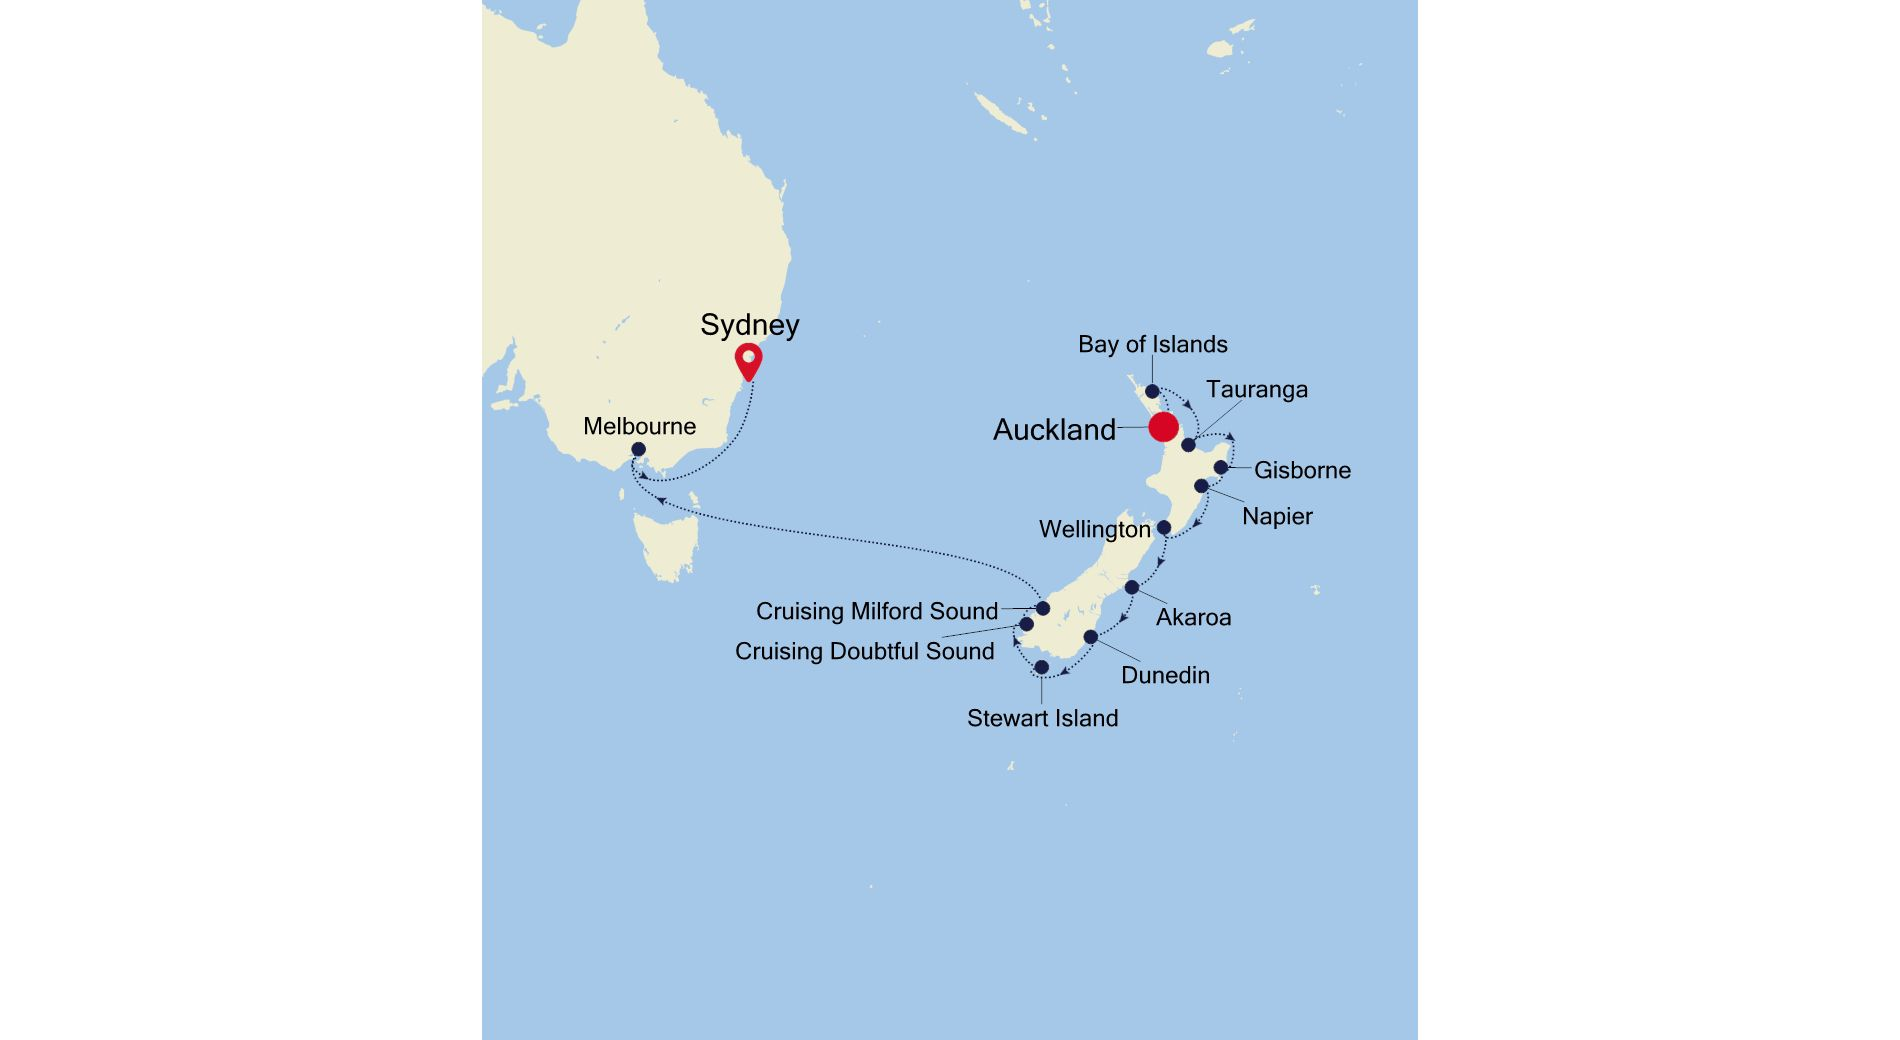 SS220218015 - Auckland à Sydney